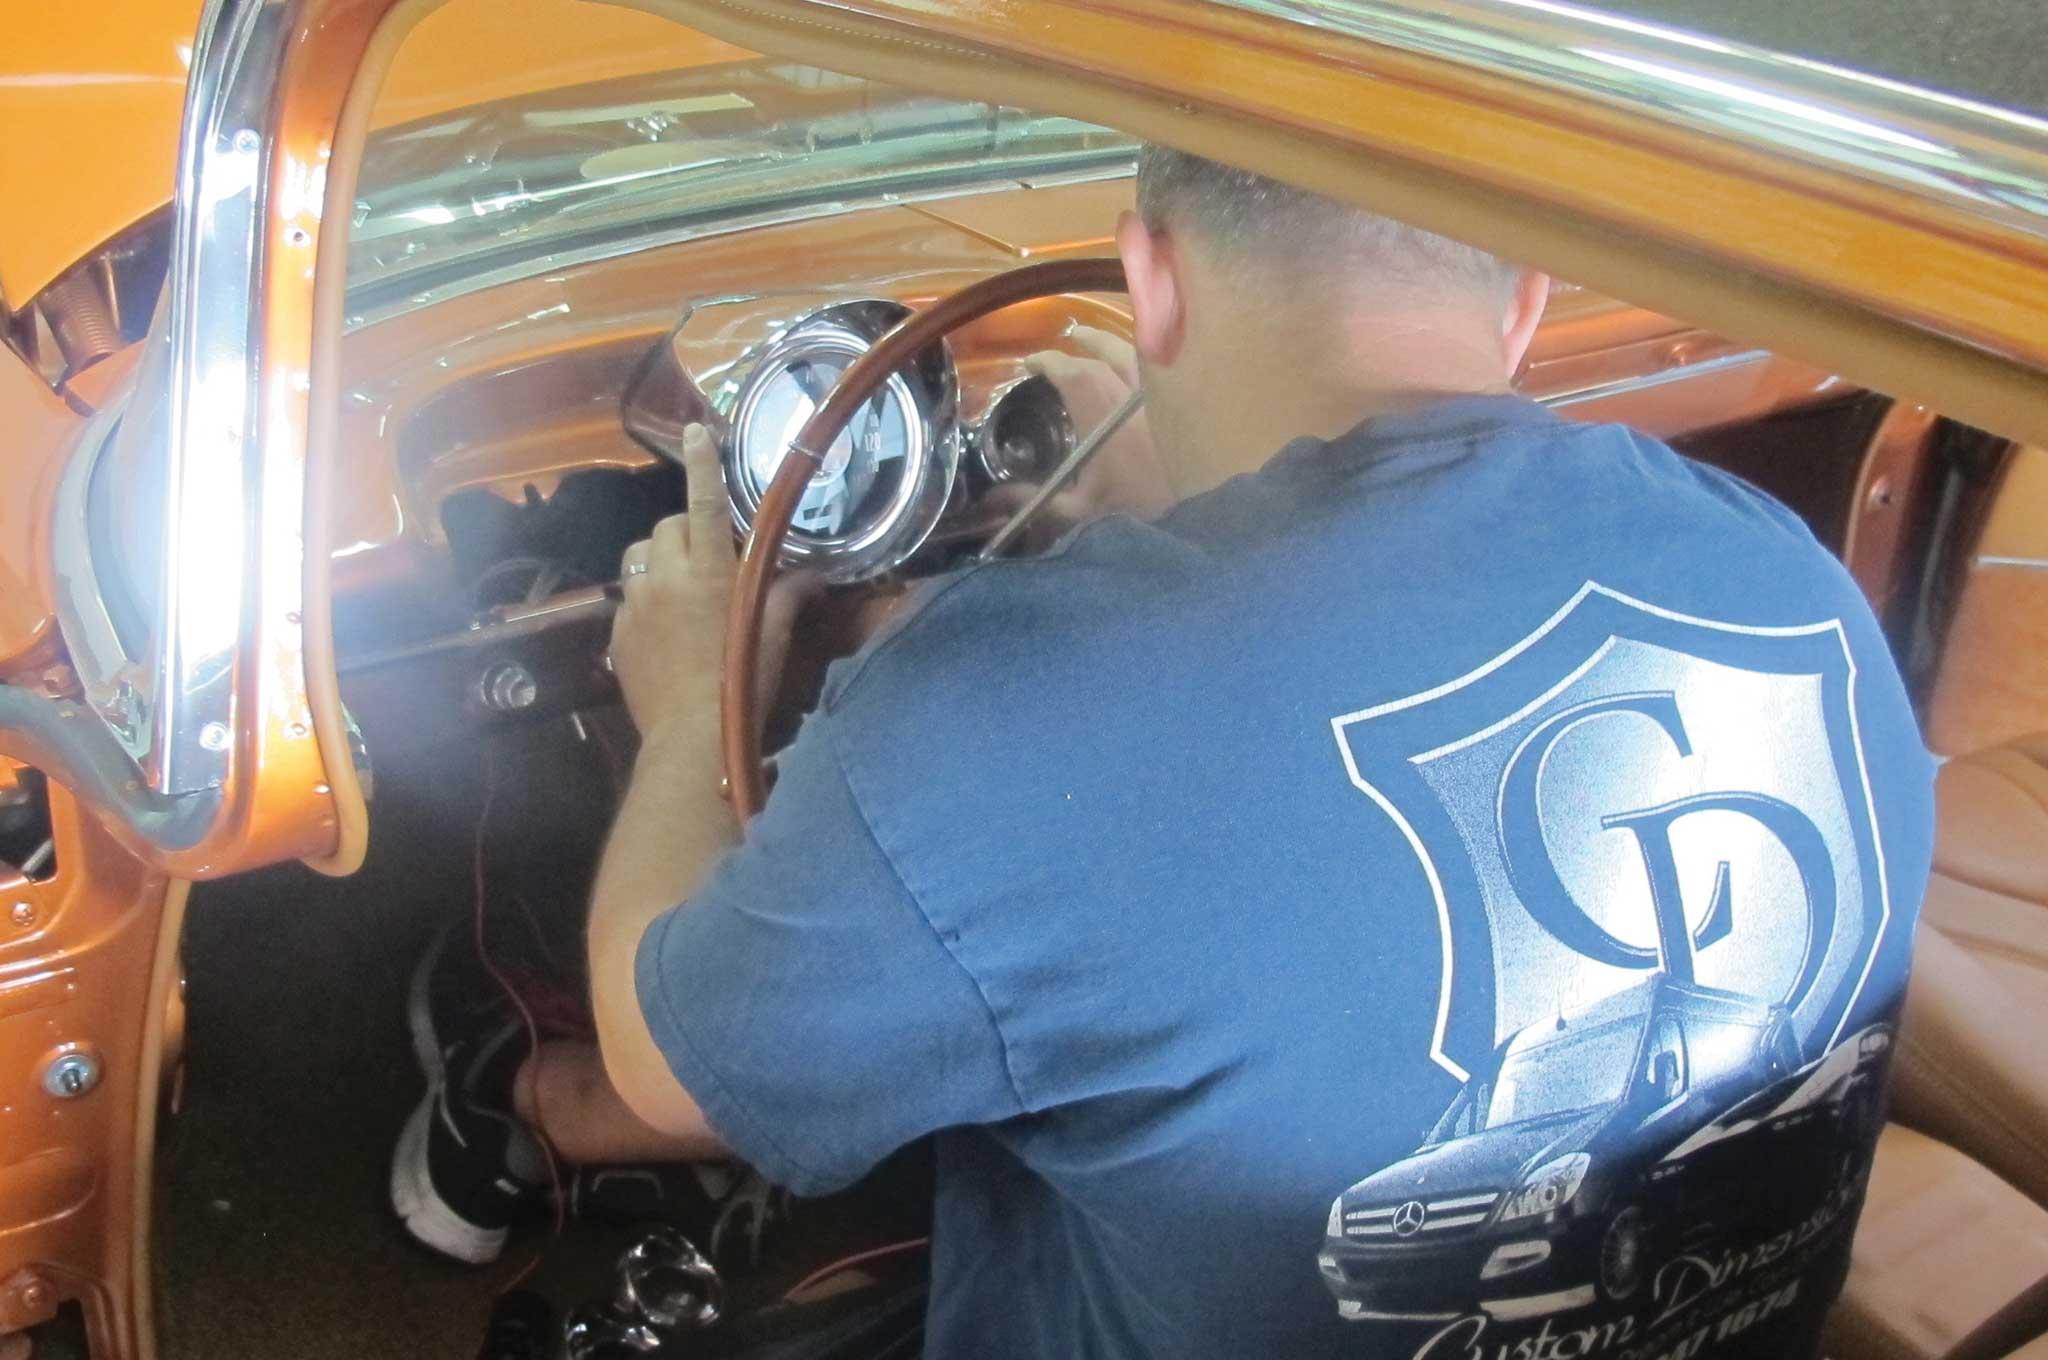 classic-industries-direct-fit-gauges-install-gauge-bezel-install